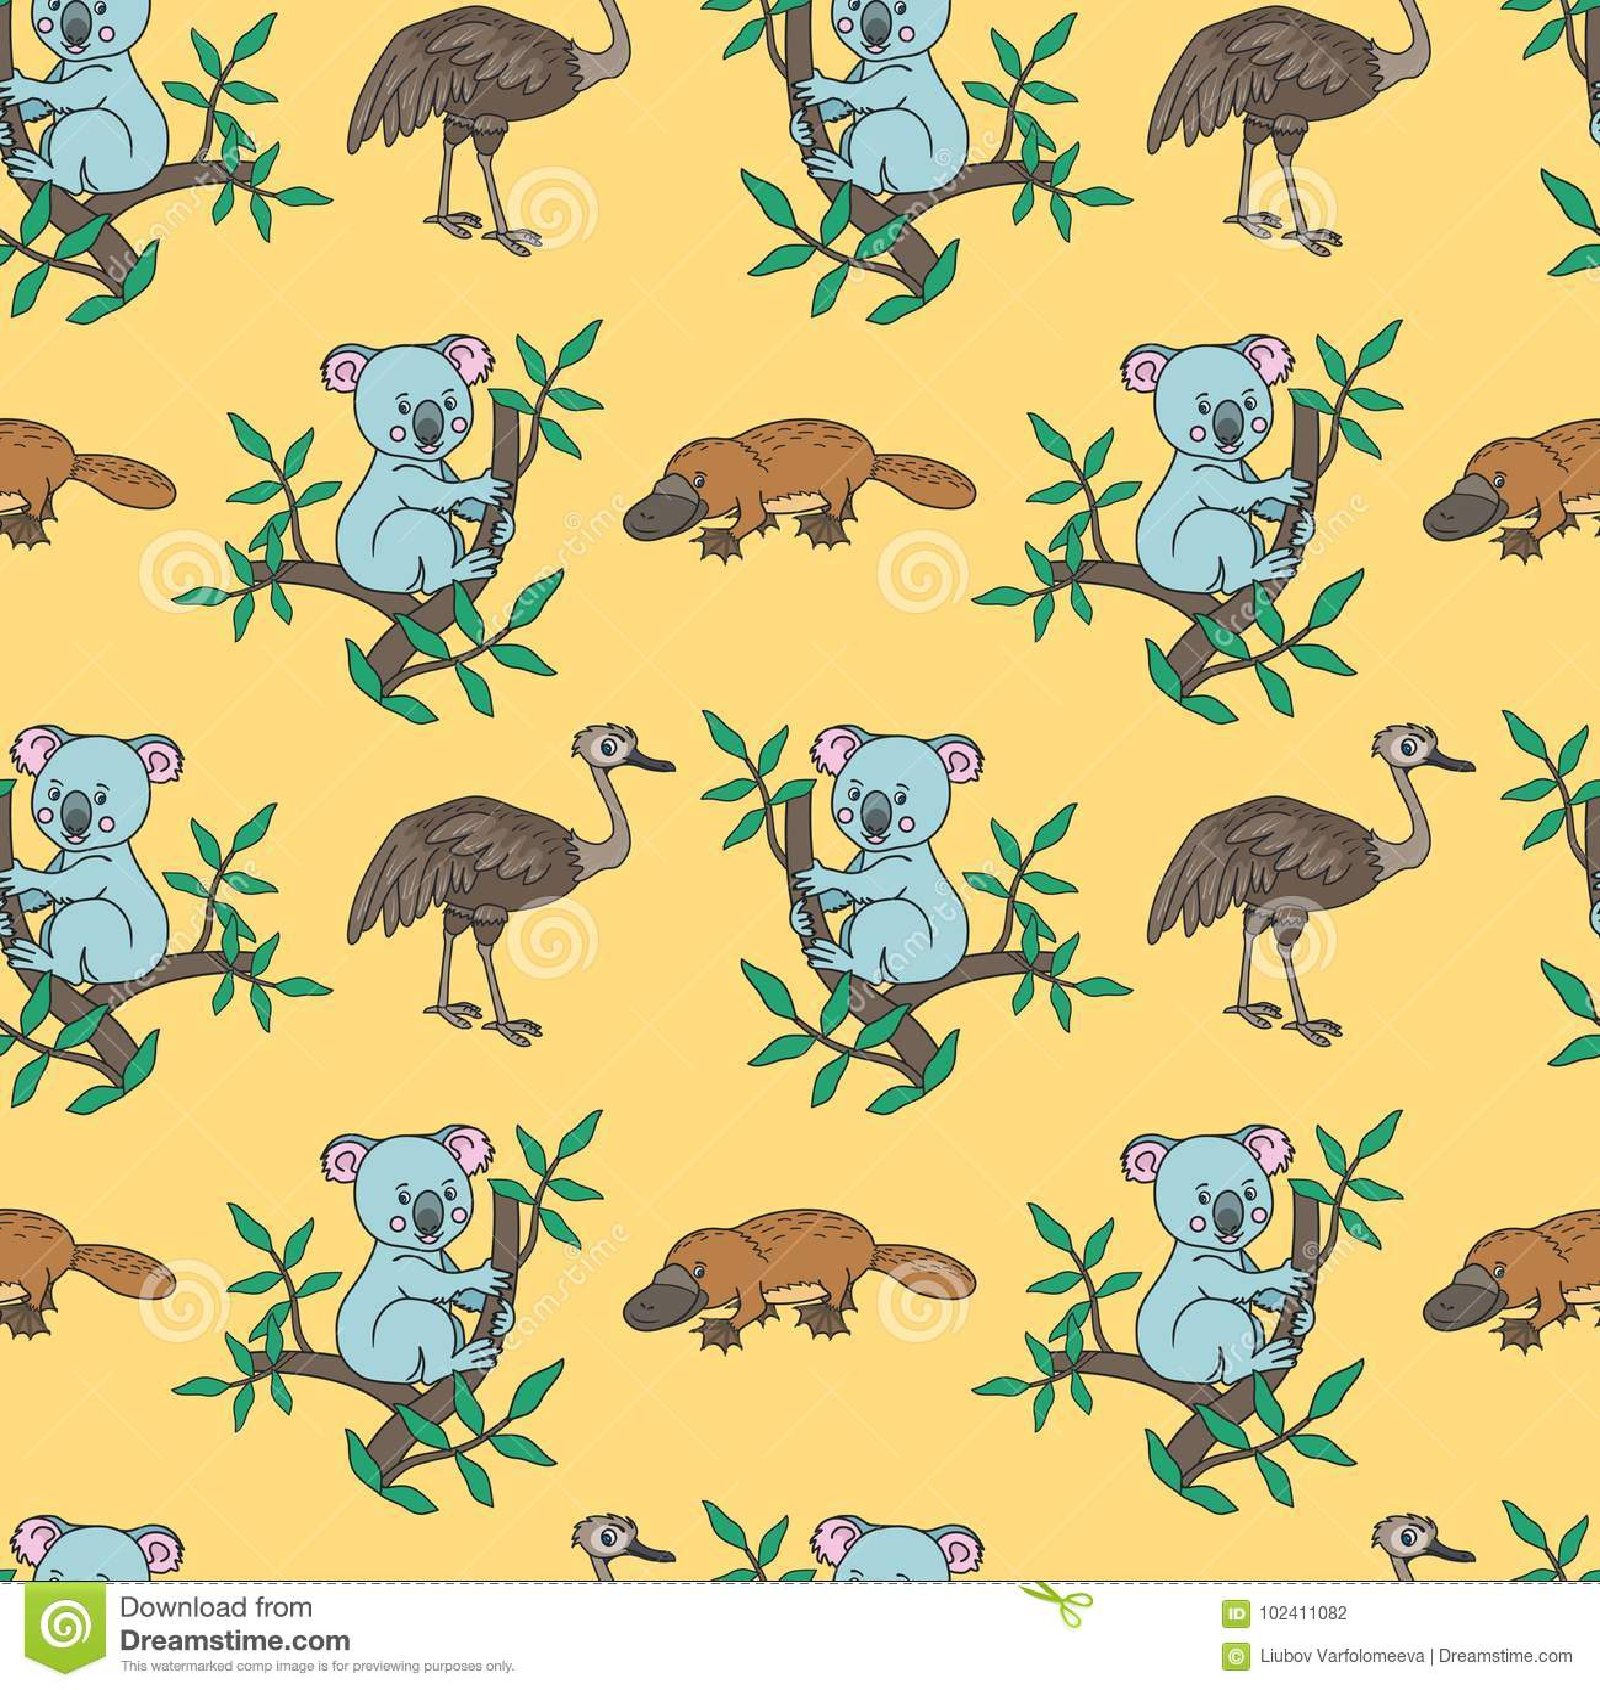 Platypus, struś, koala